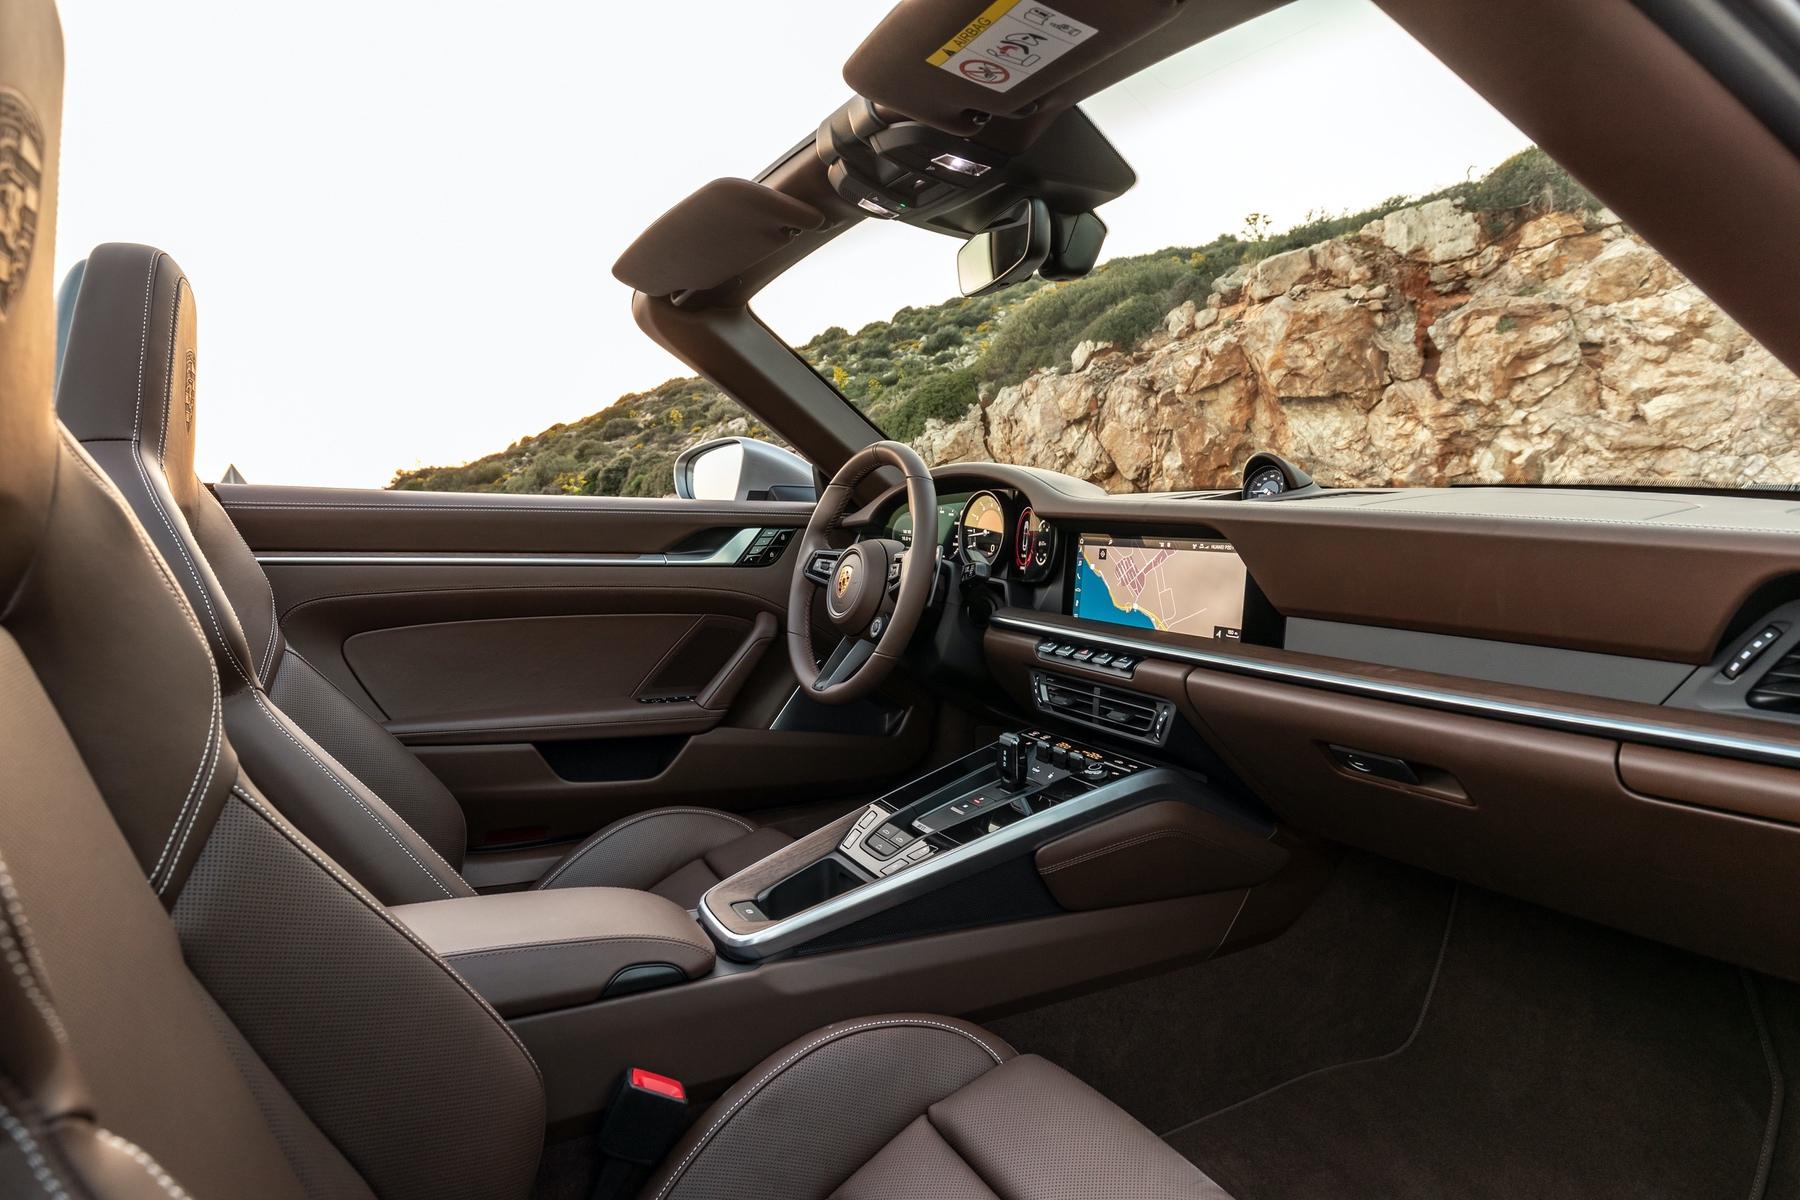 Test_Drive_Porsche_911_Athens_0207